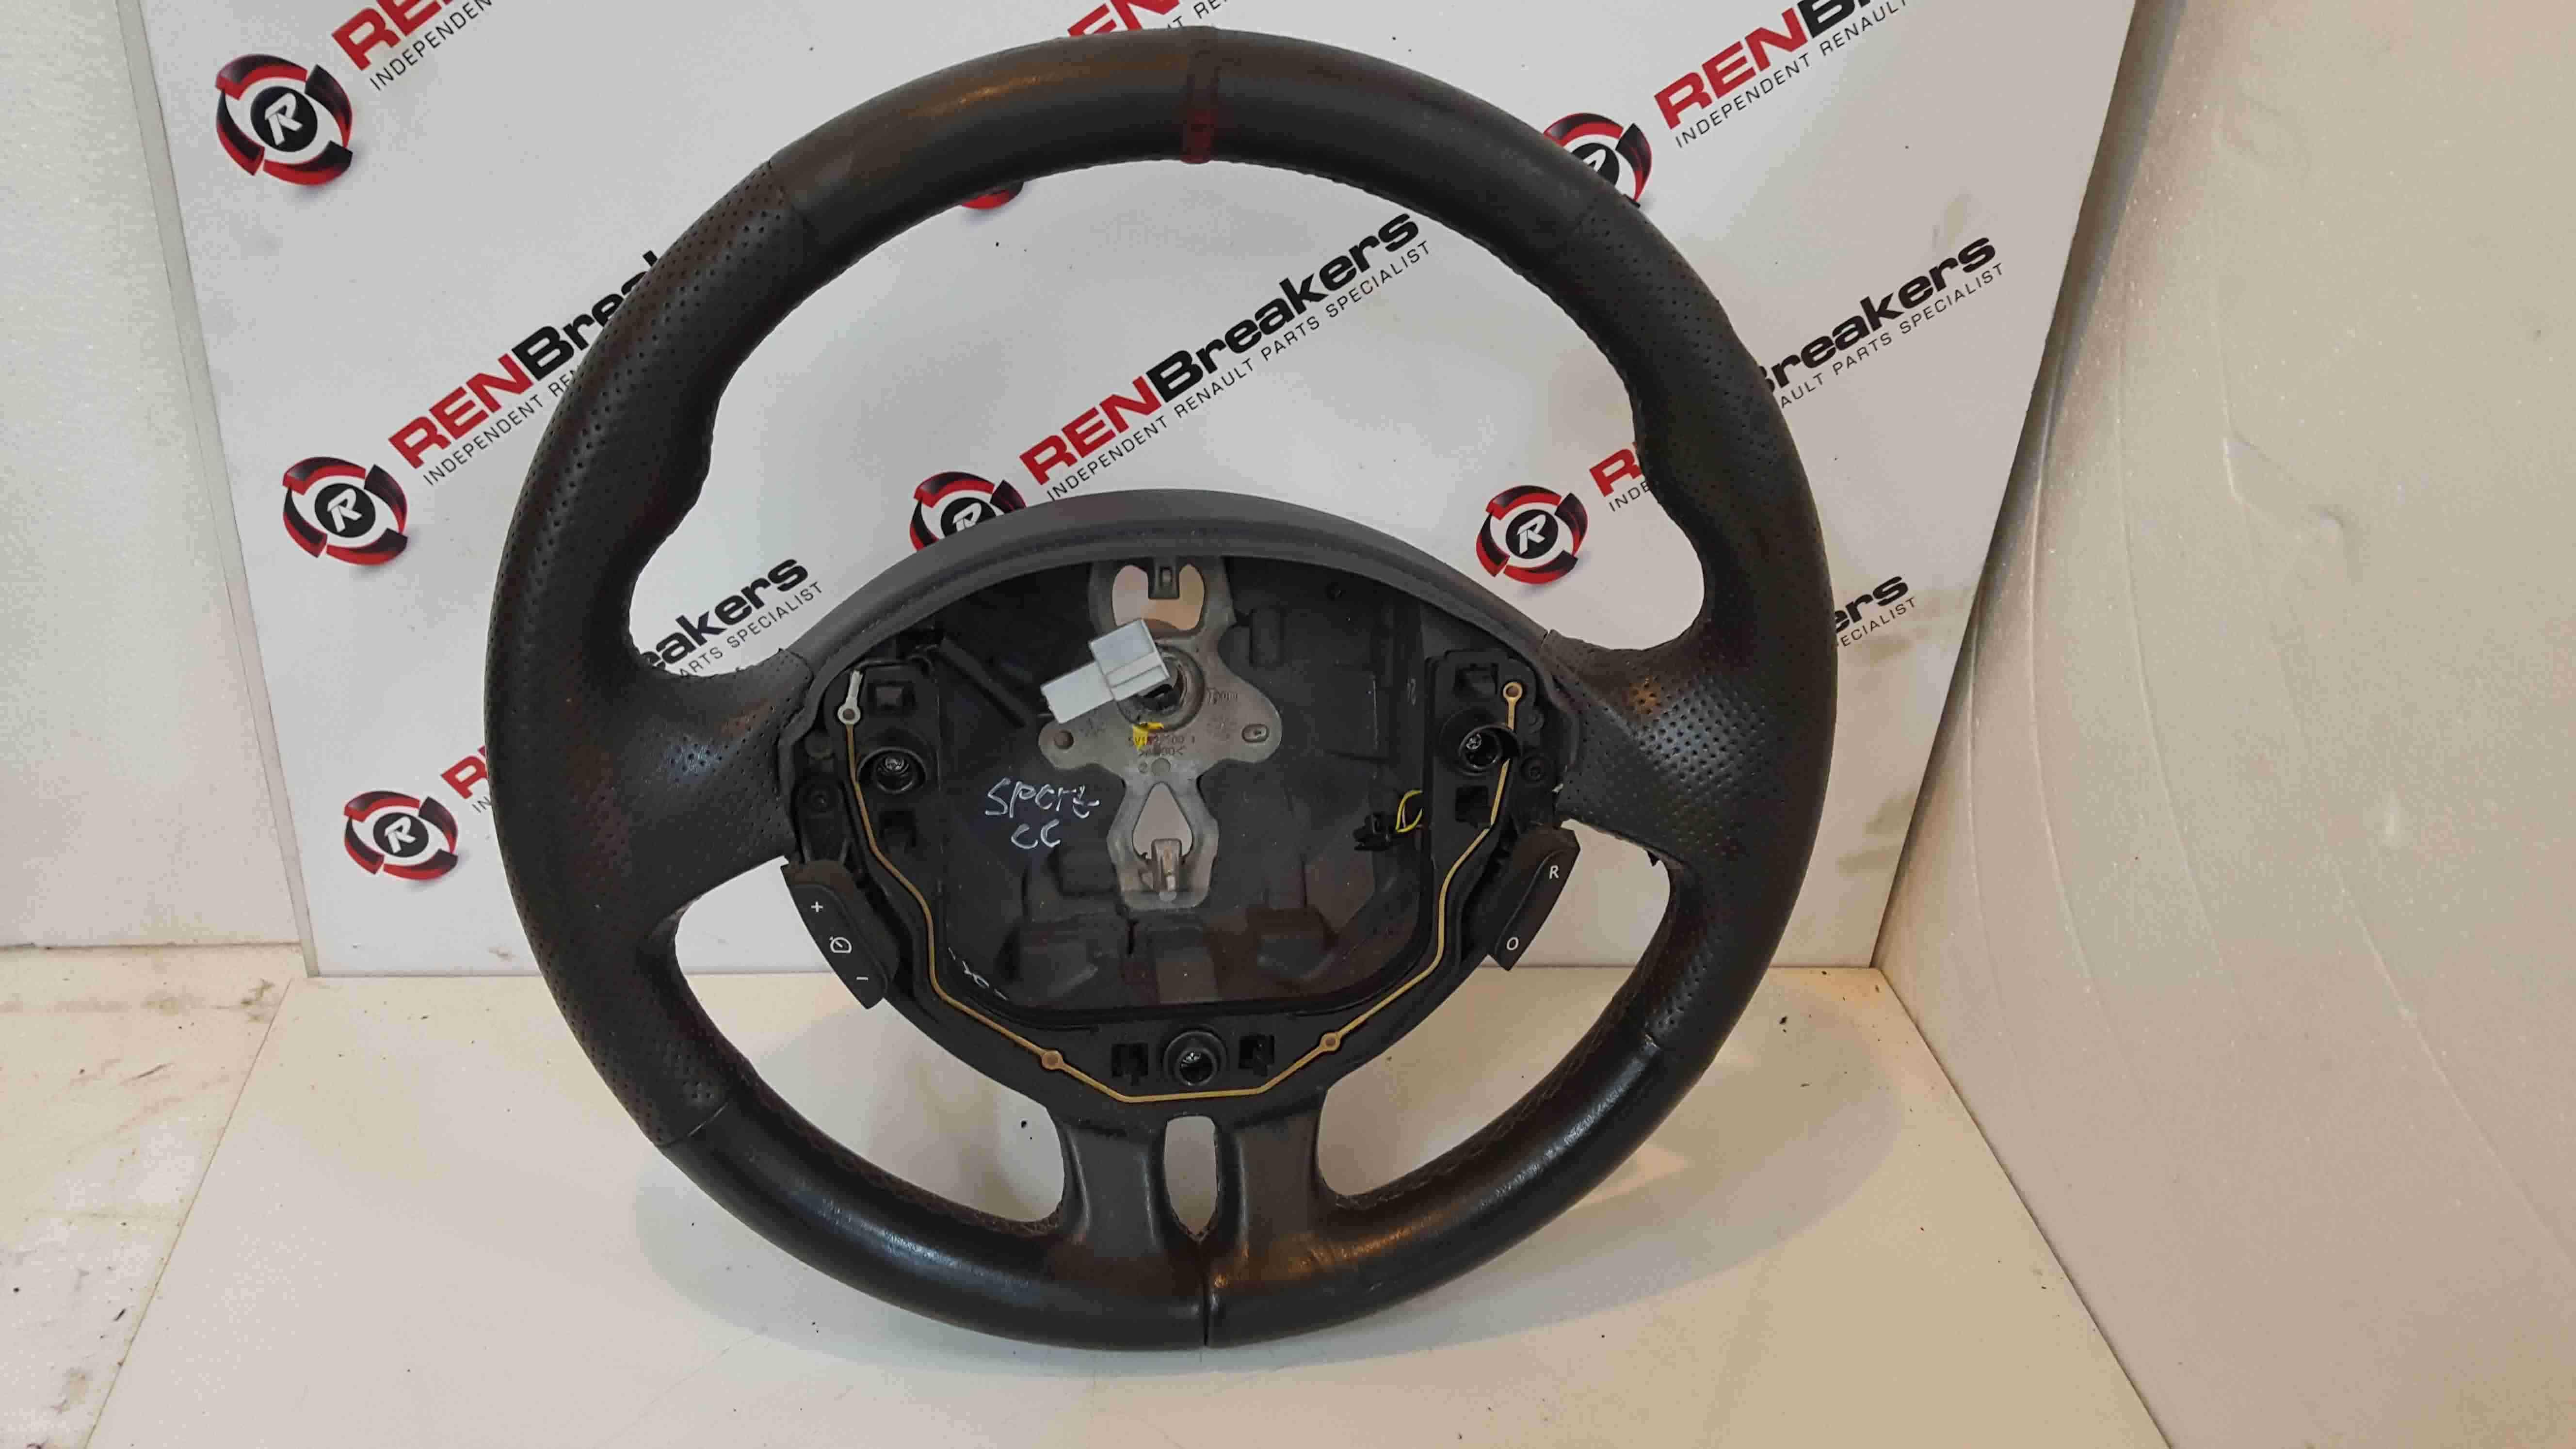 Renault Clio Sport MK3 2005-2012 197 200 Steering Wheel Red Stitching Cruise